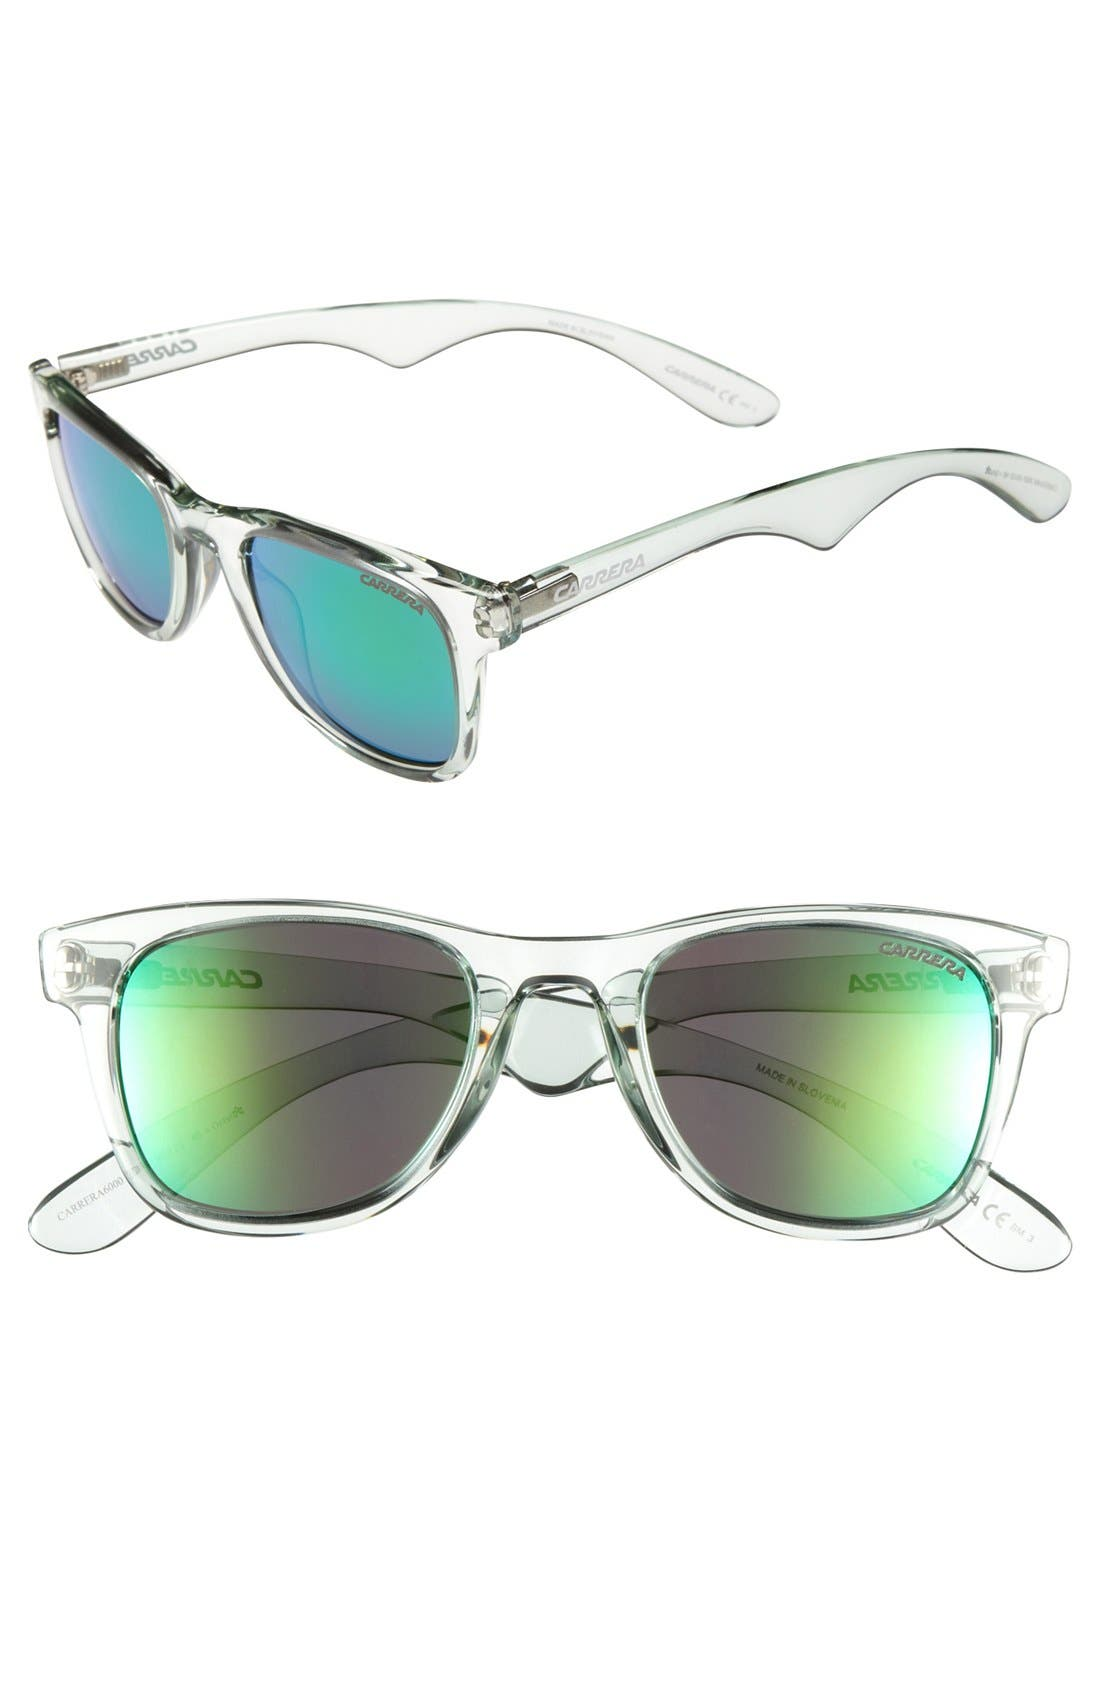 Main Image - Carrera Eyewear 50mm Sunglasses